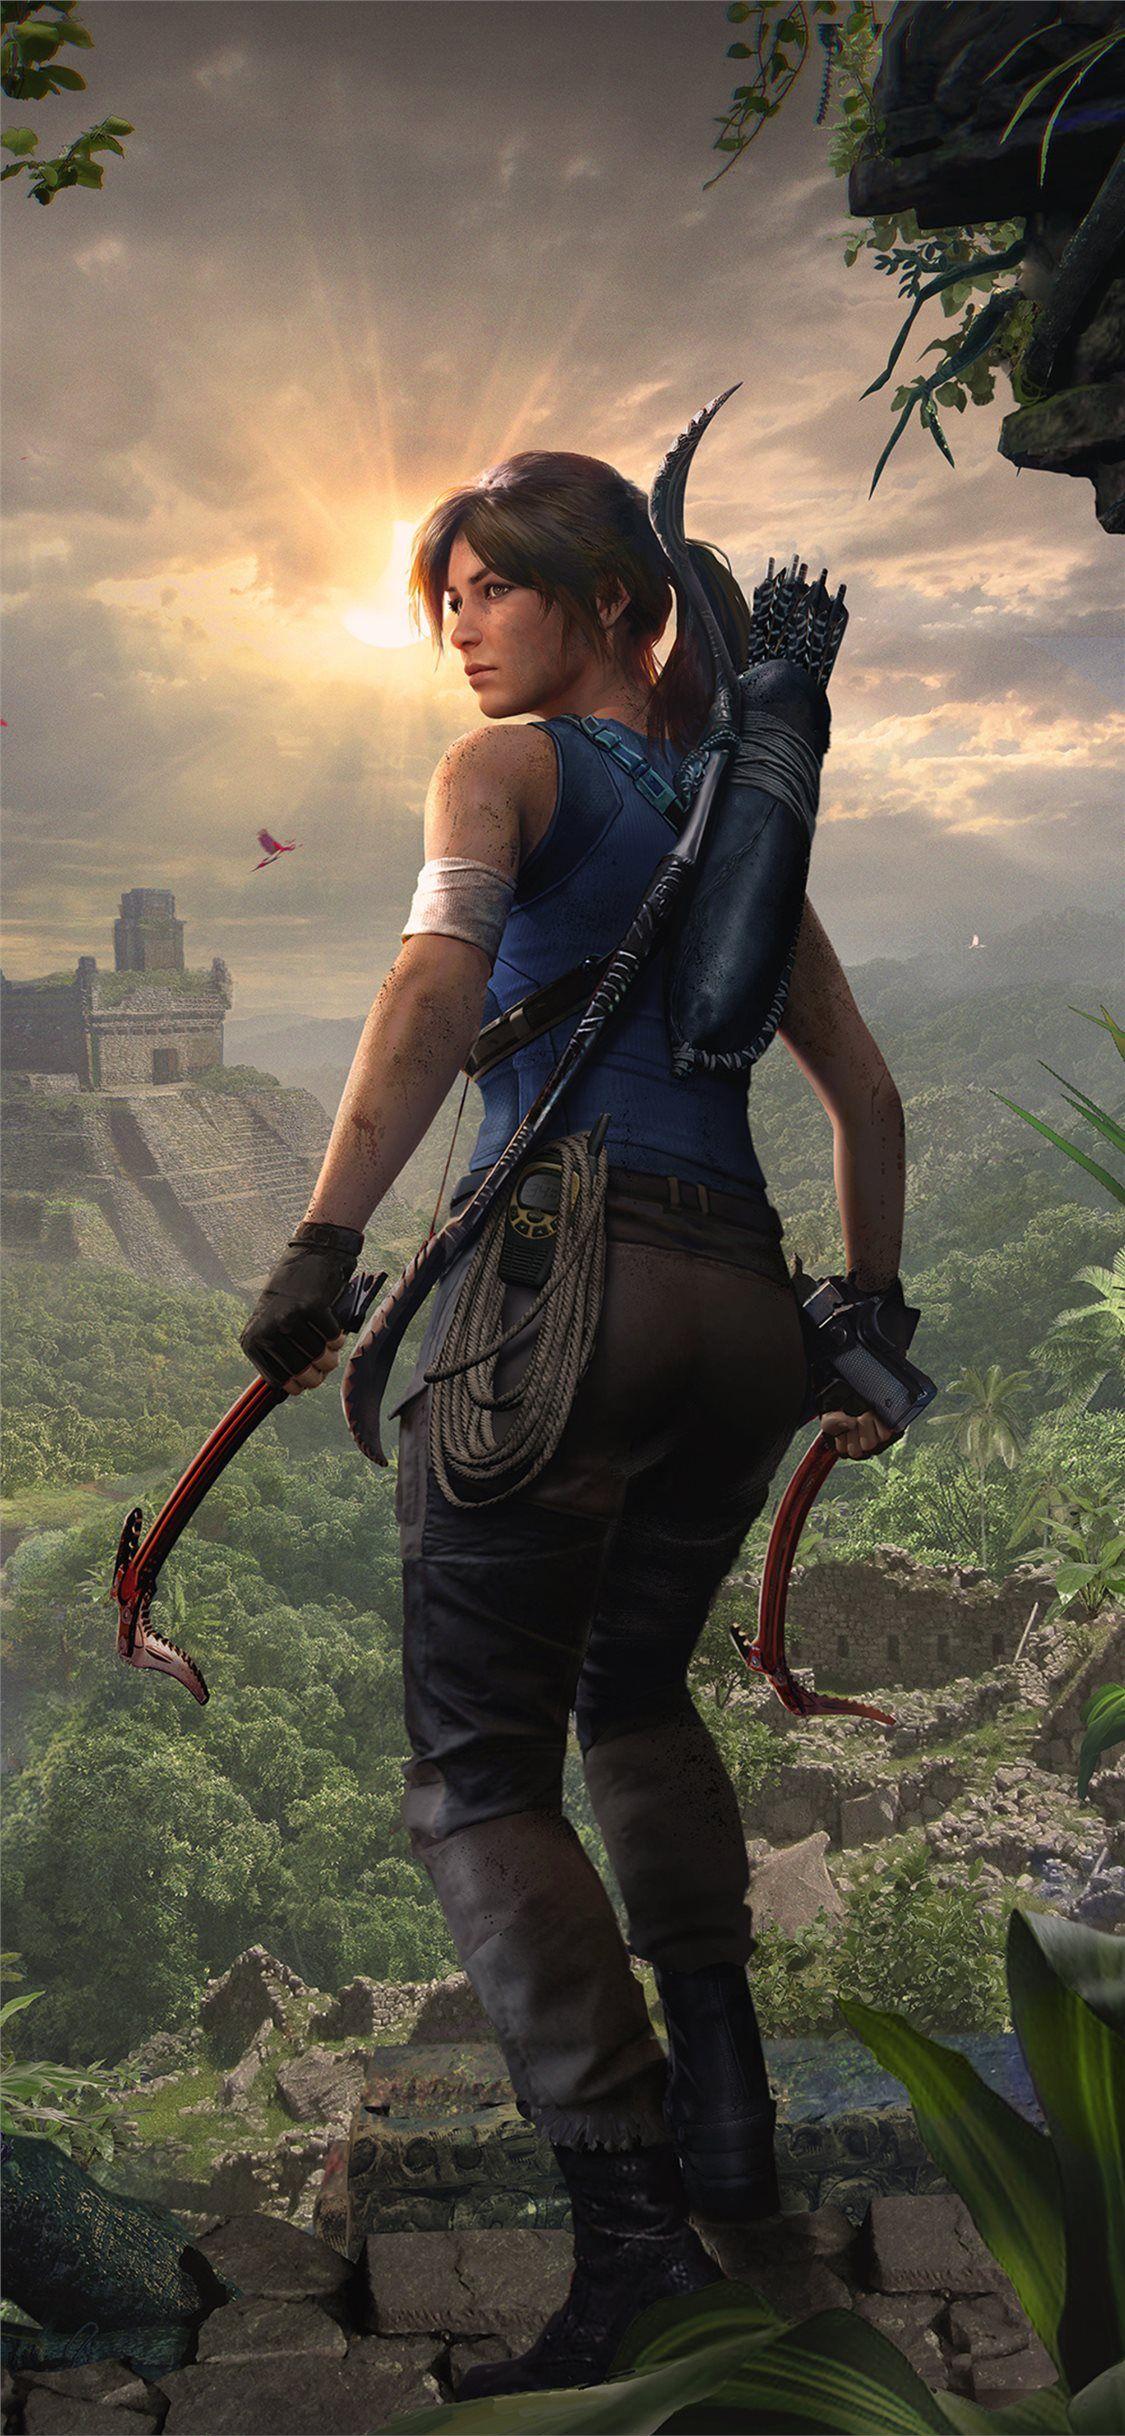 2019 Shadow Of The Tomb Raider Lara Croft 4k Iphone 11 Wallpapers